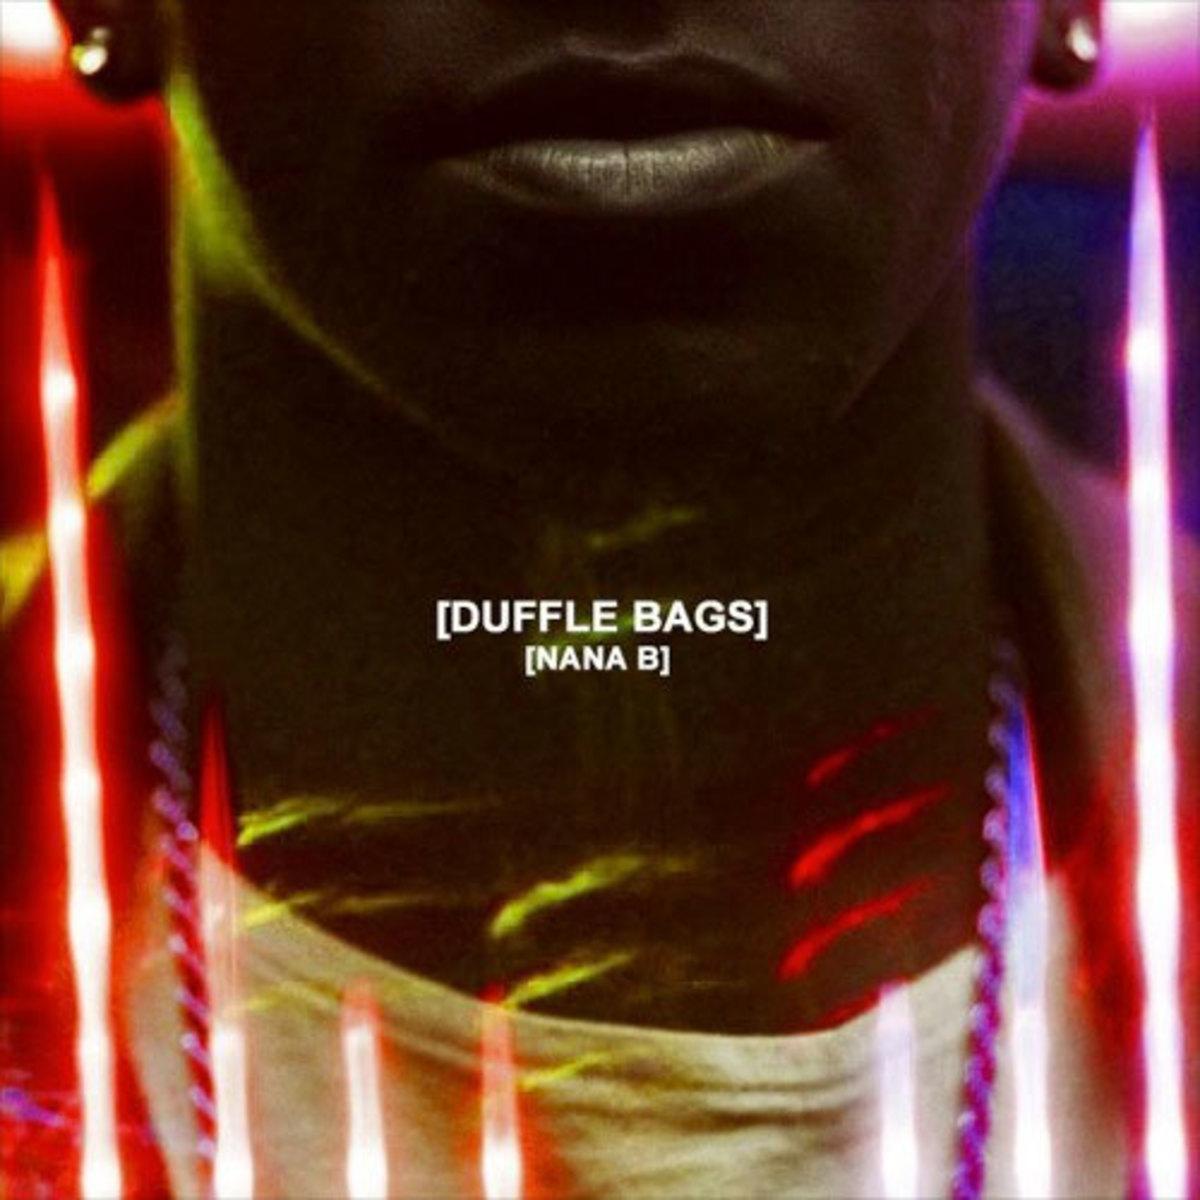 nana-b-duffle-bags.jpg